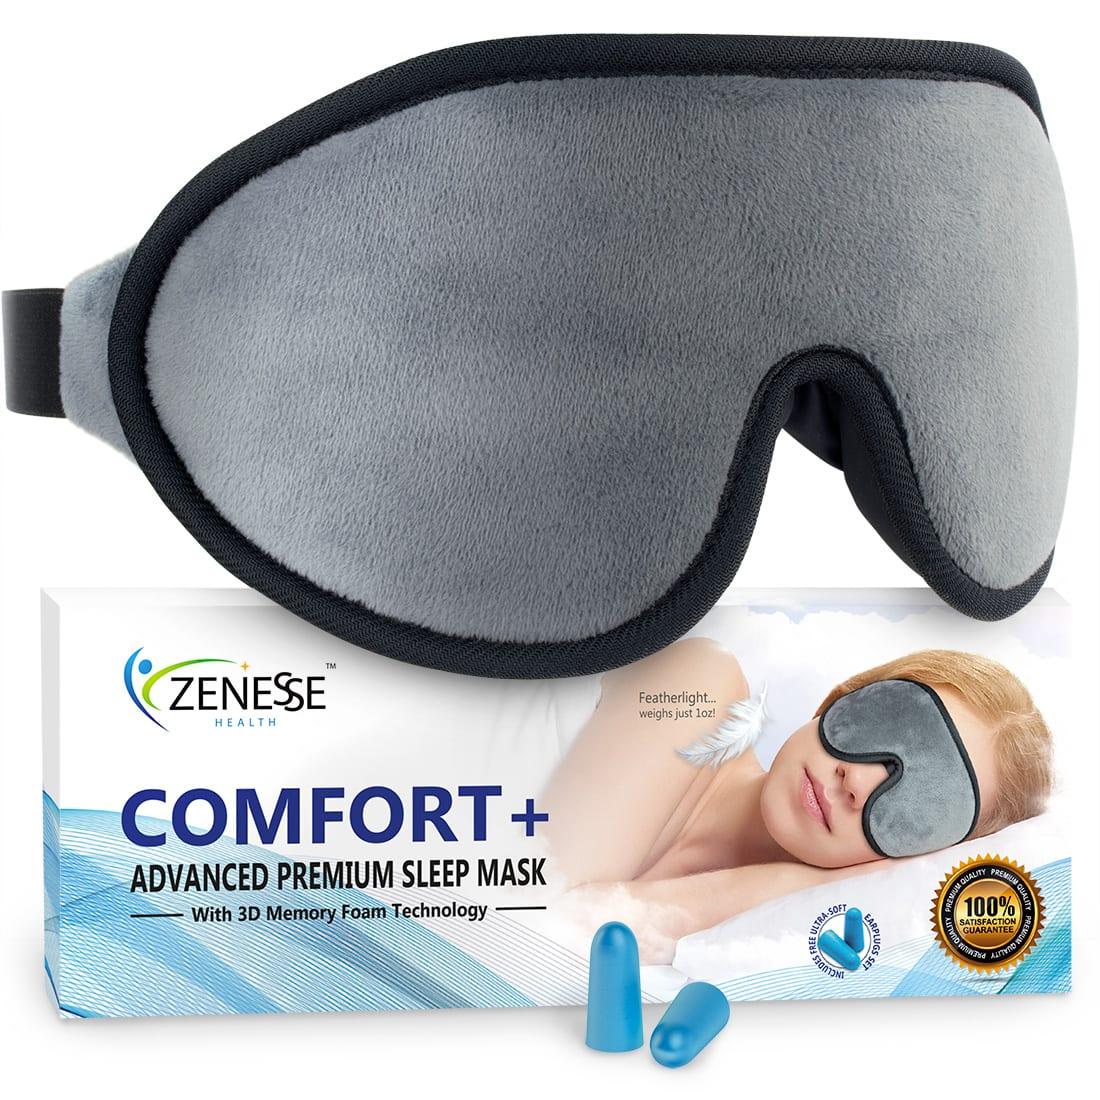 b78045baa Comfort+ Advanced Premium Sleep Mask